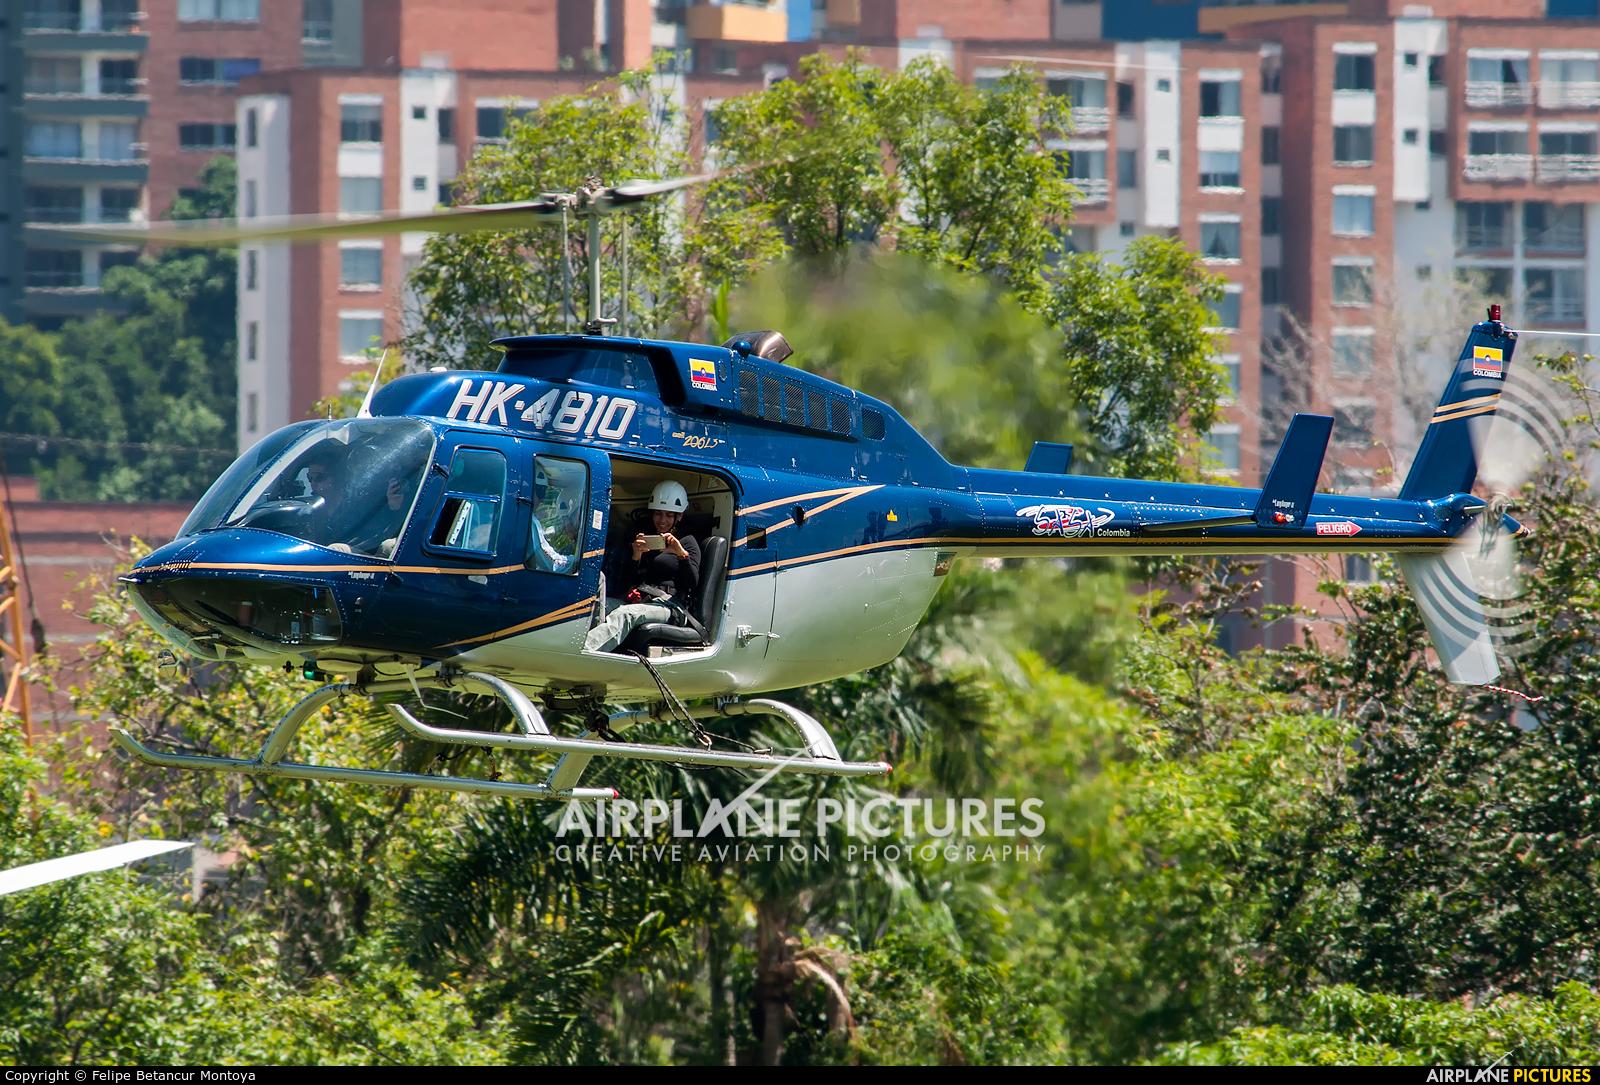 Private HK-4810 aircraft at Medellin - Olaya Herrera